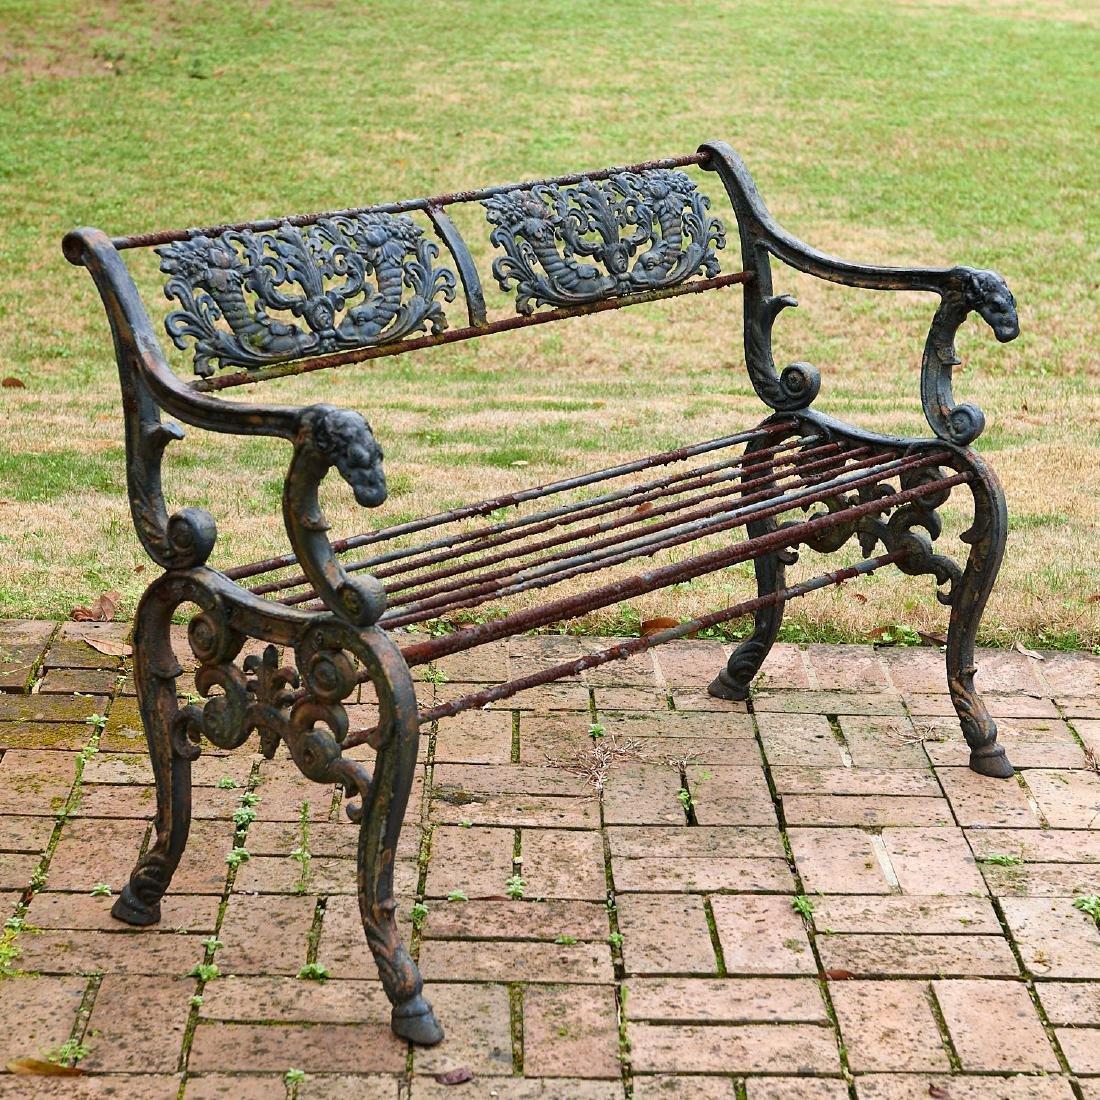 Antique painted cast iron garden bench